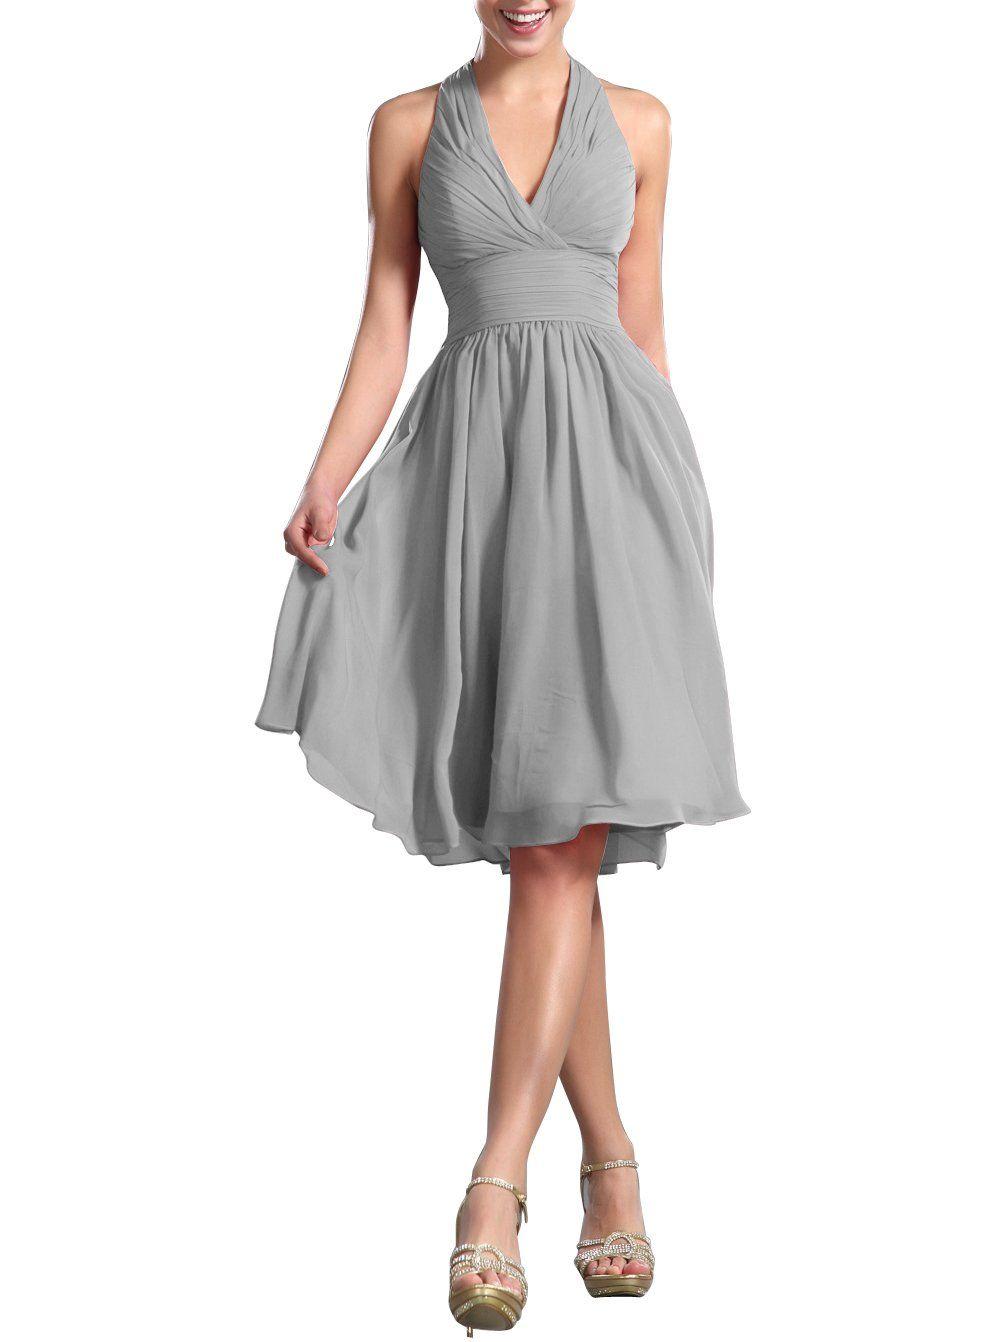 Huafeiwude womenus knee length halter dress bridesmaid dresses grey